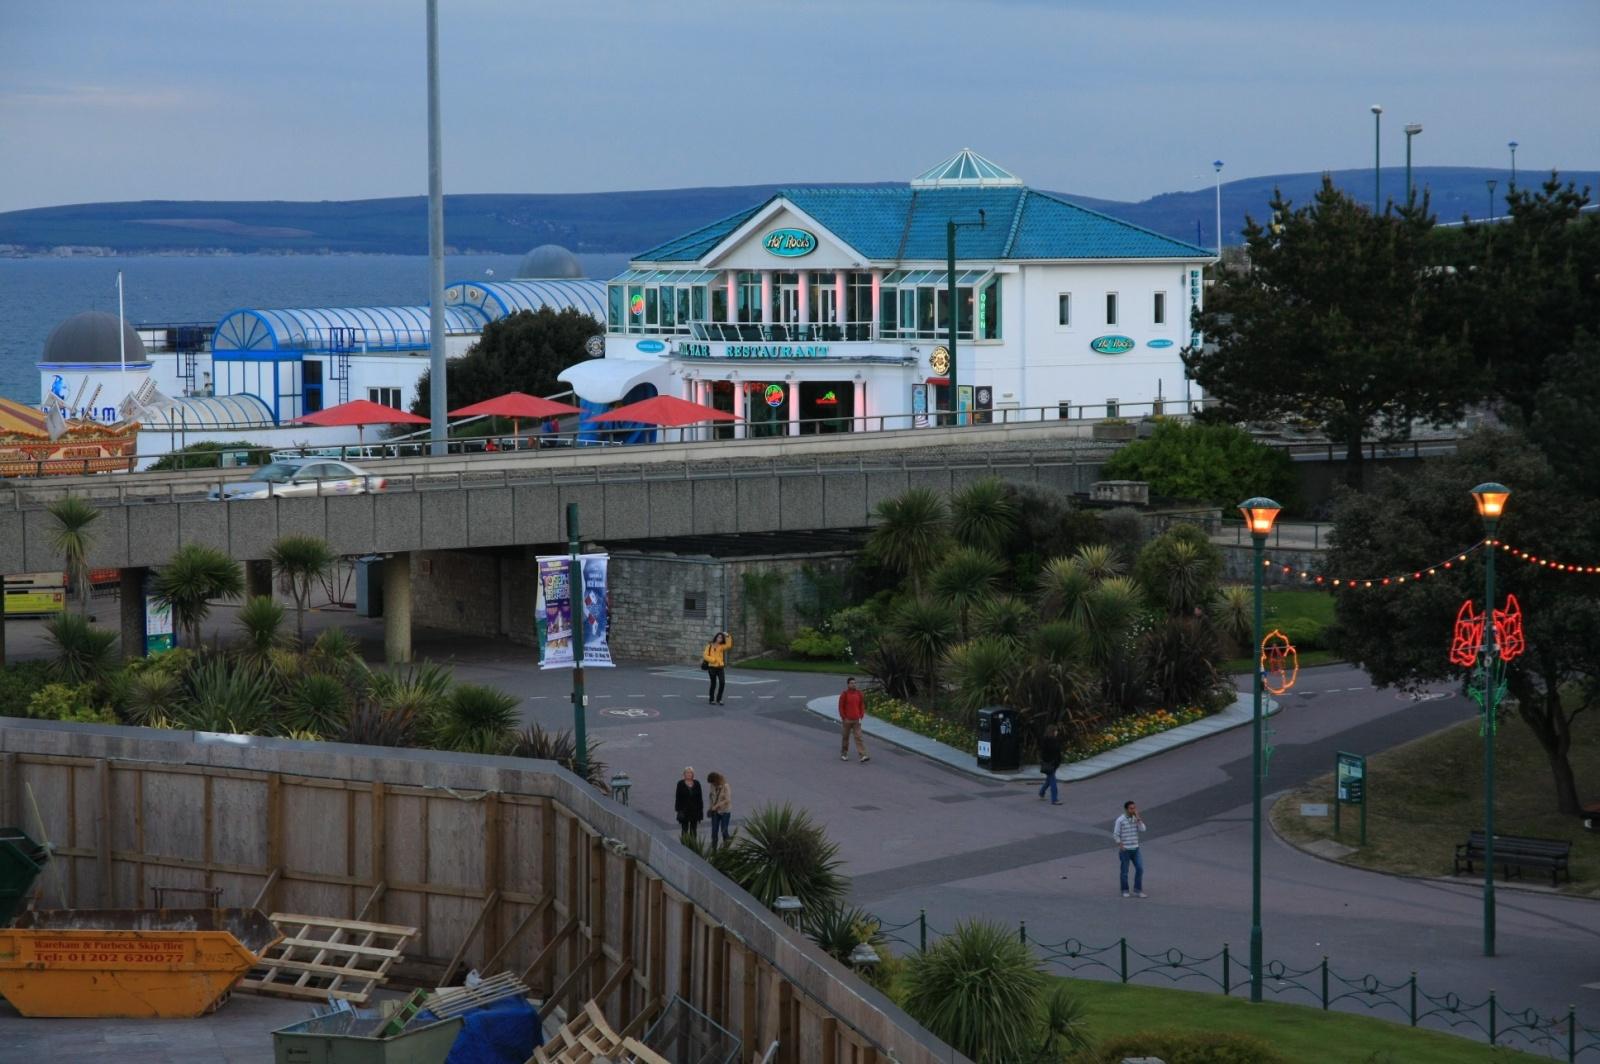 Approaching Bournemouth pier